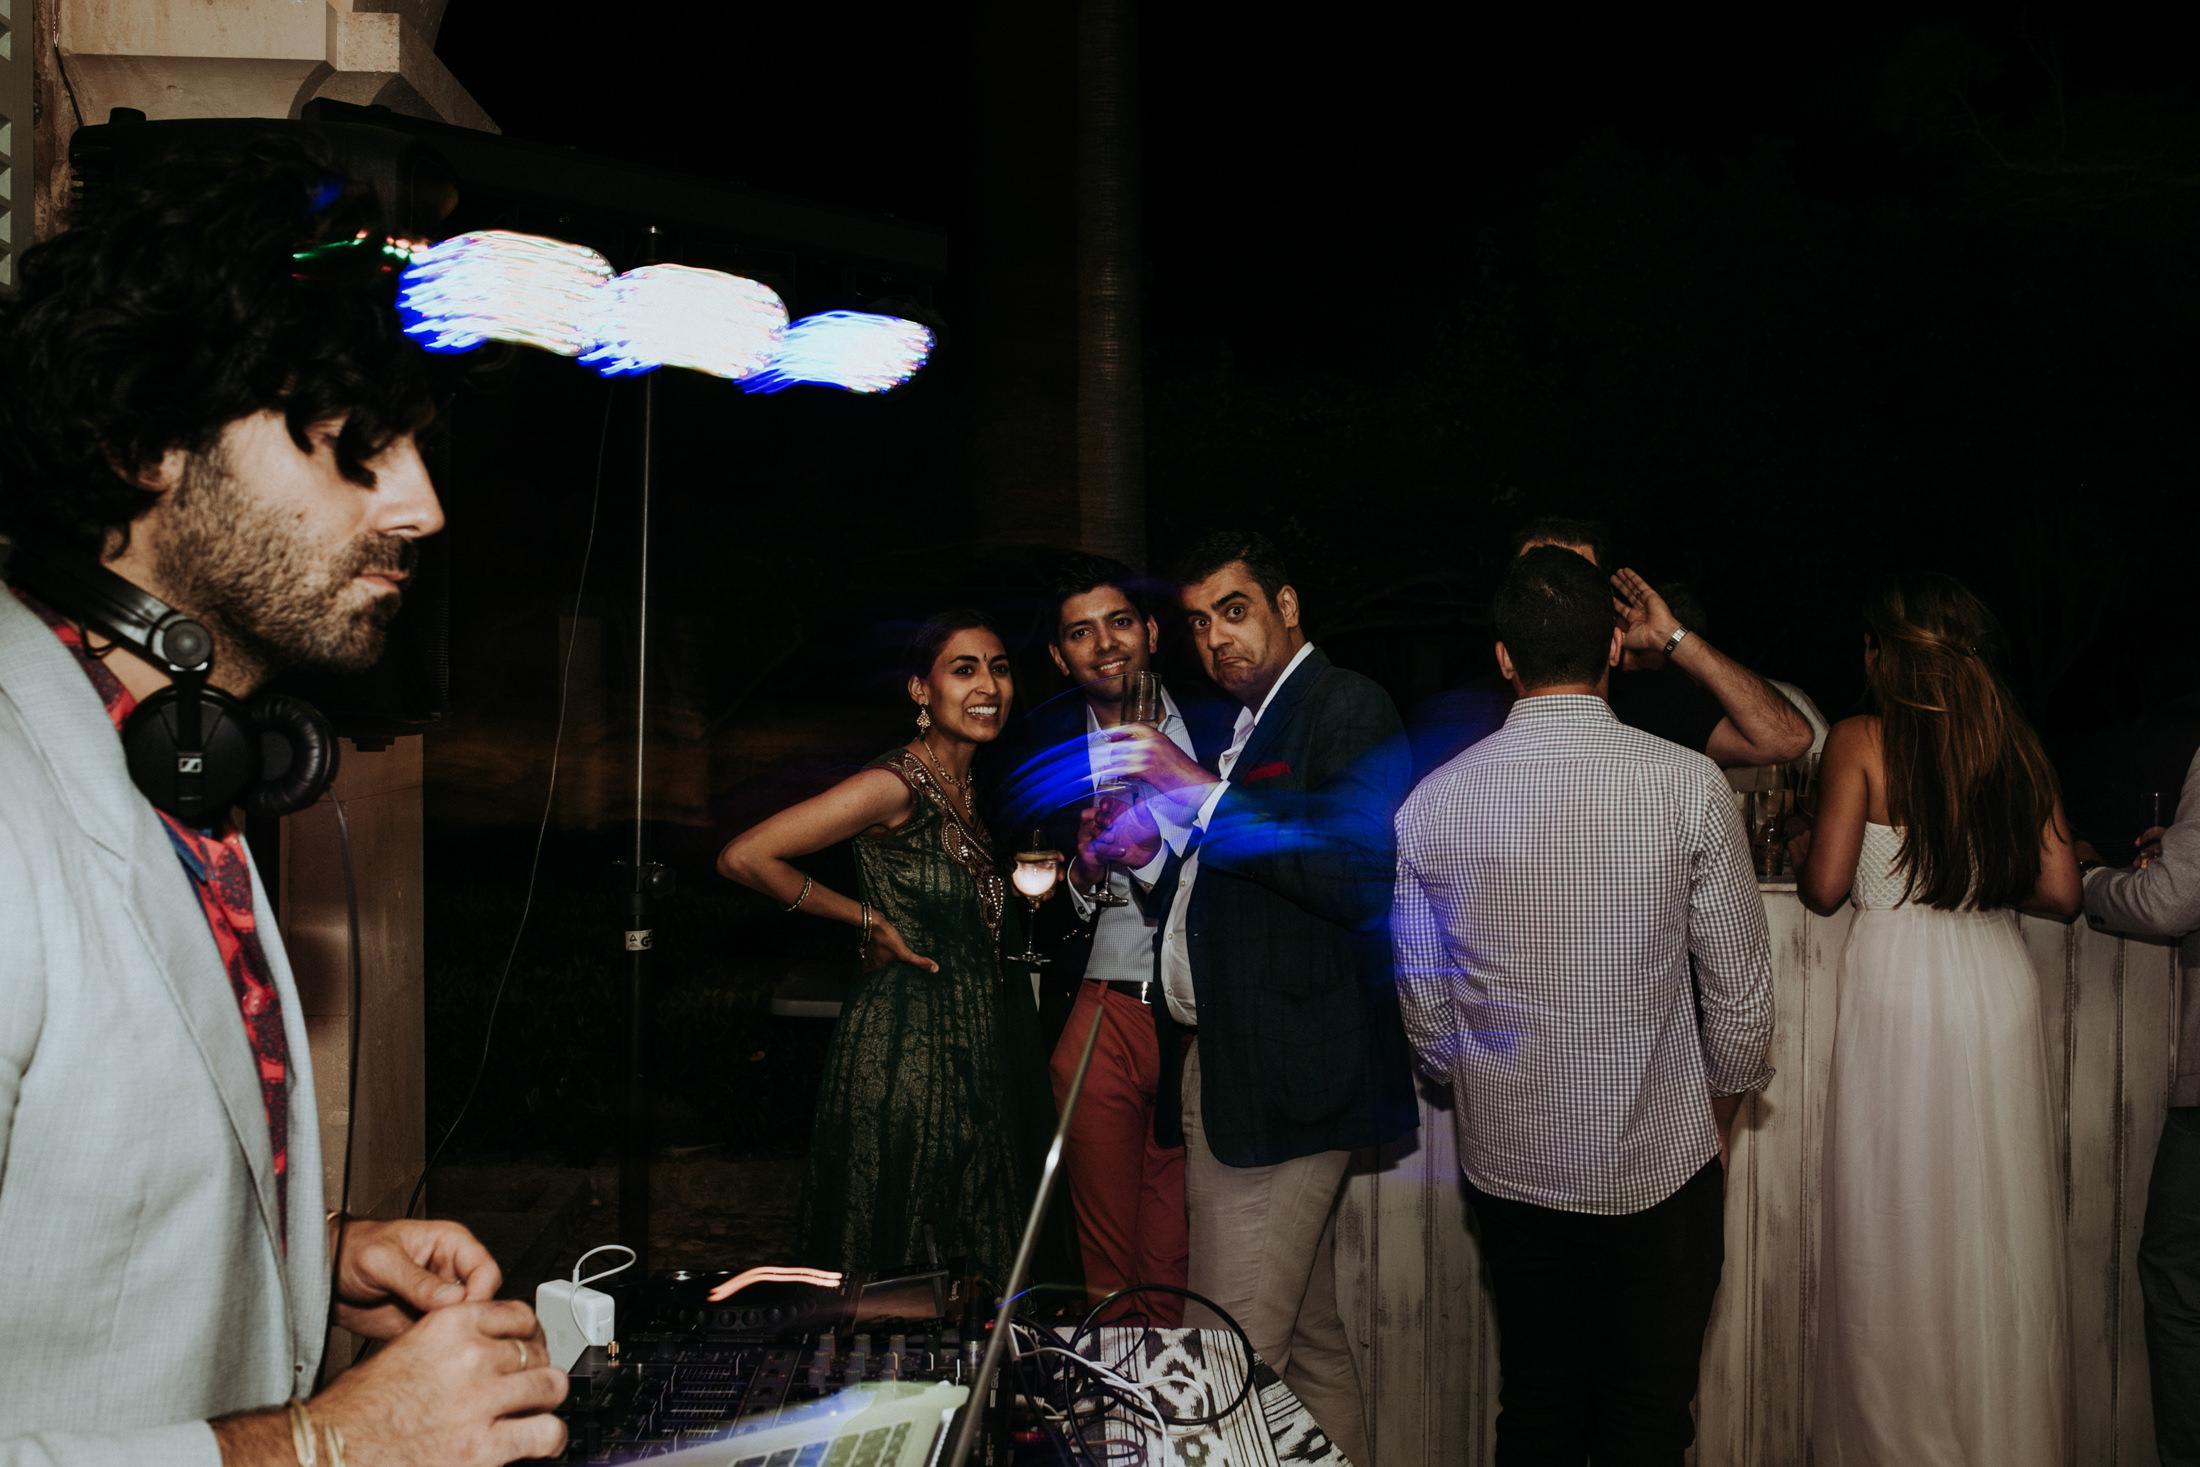 Wedding_Photographer_Mallorca_Daniela-Marquardt_Photography_New_York_Iceland_Tuscany_Santorini_Portugal_Austria_Bavaria_Elopement_Hochzeitsfotograf_AntjeRajat1_58